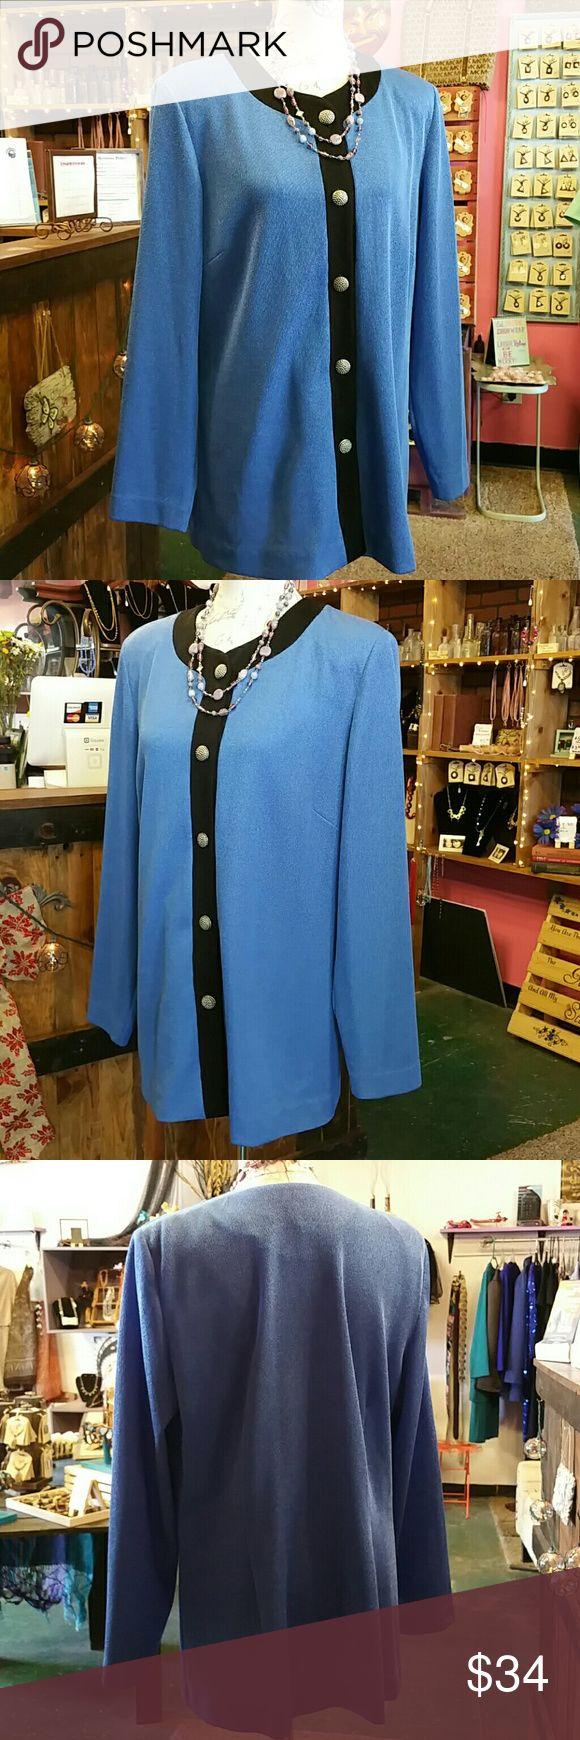 Design your own t shirt columbus ohio - Leslie Fay Long Top